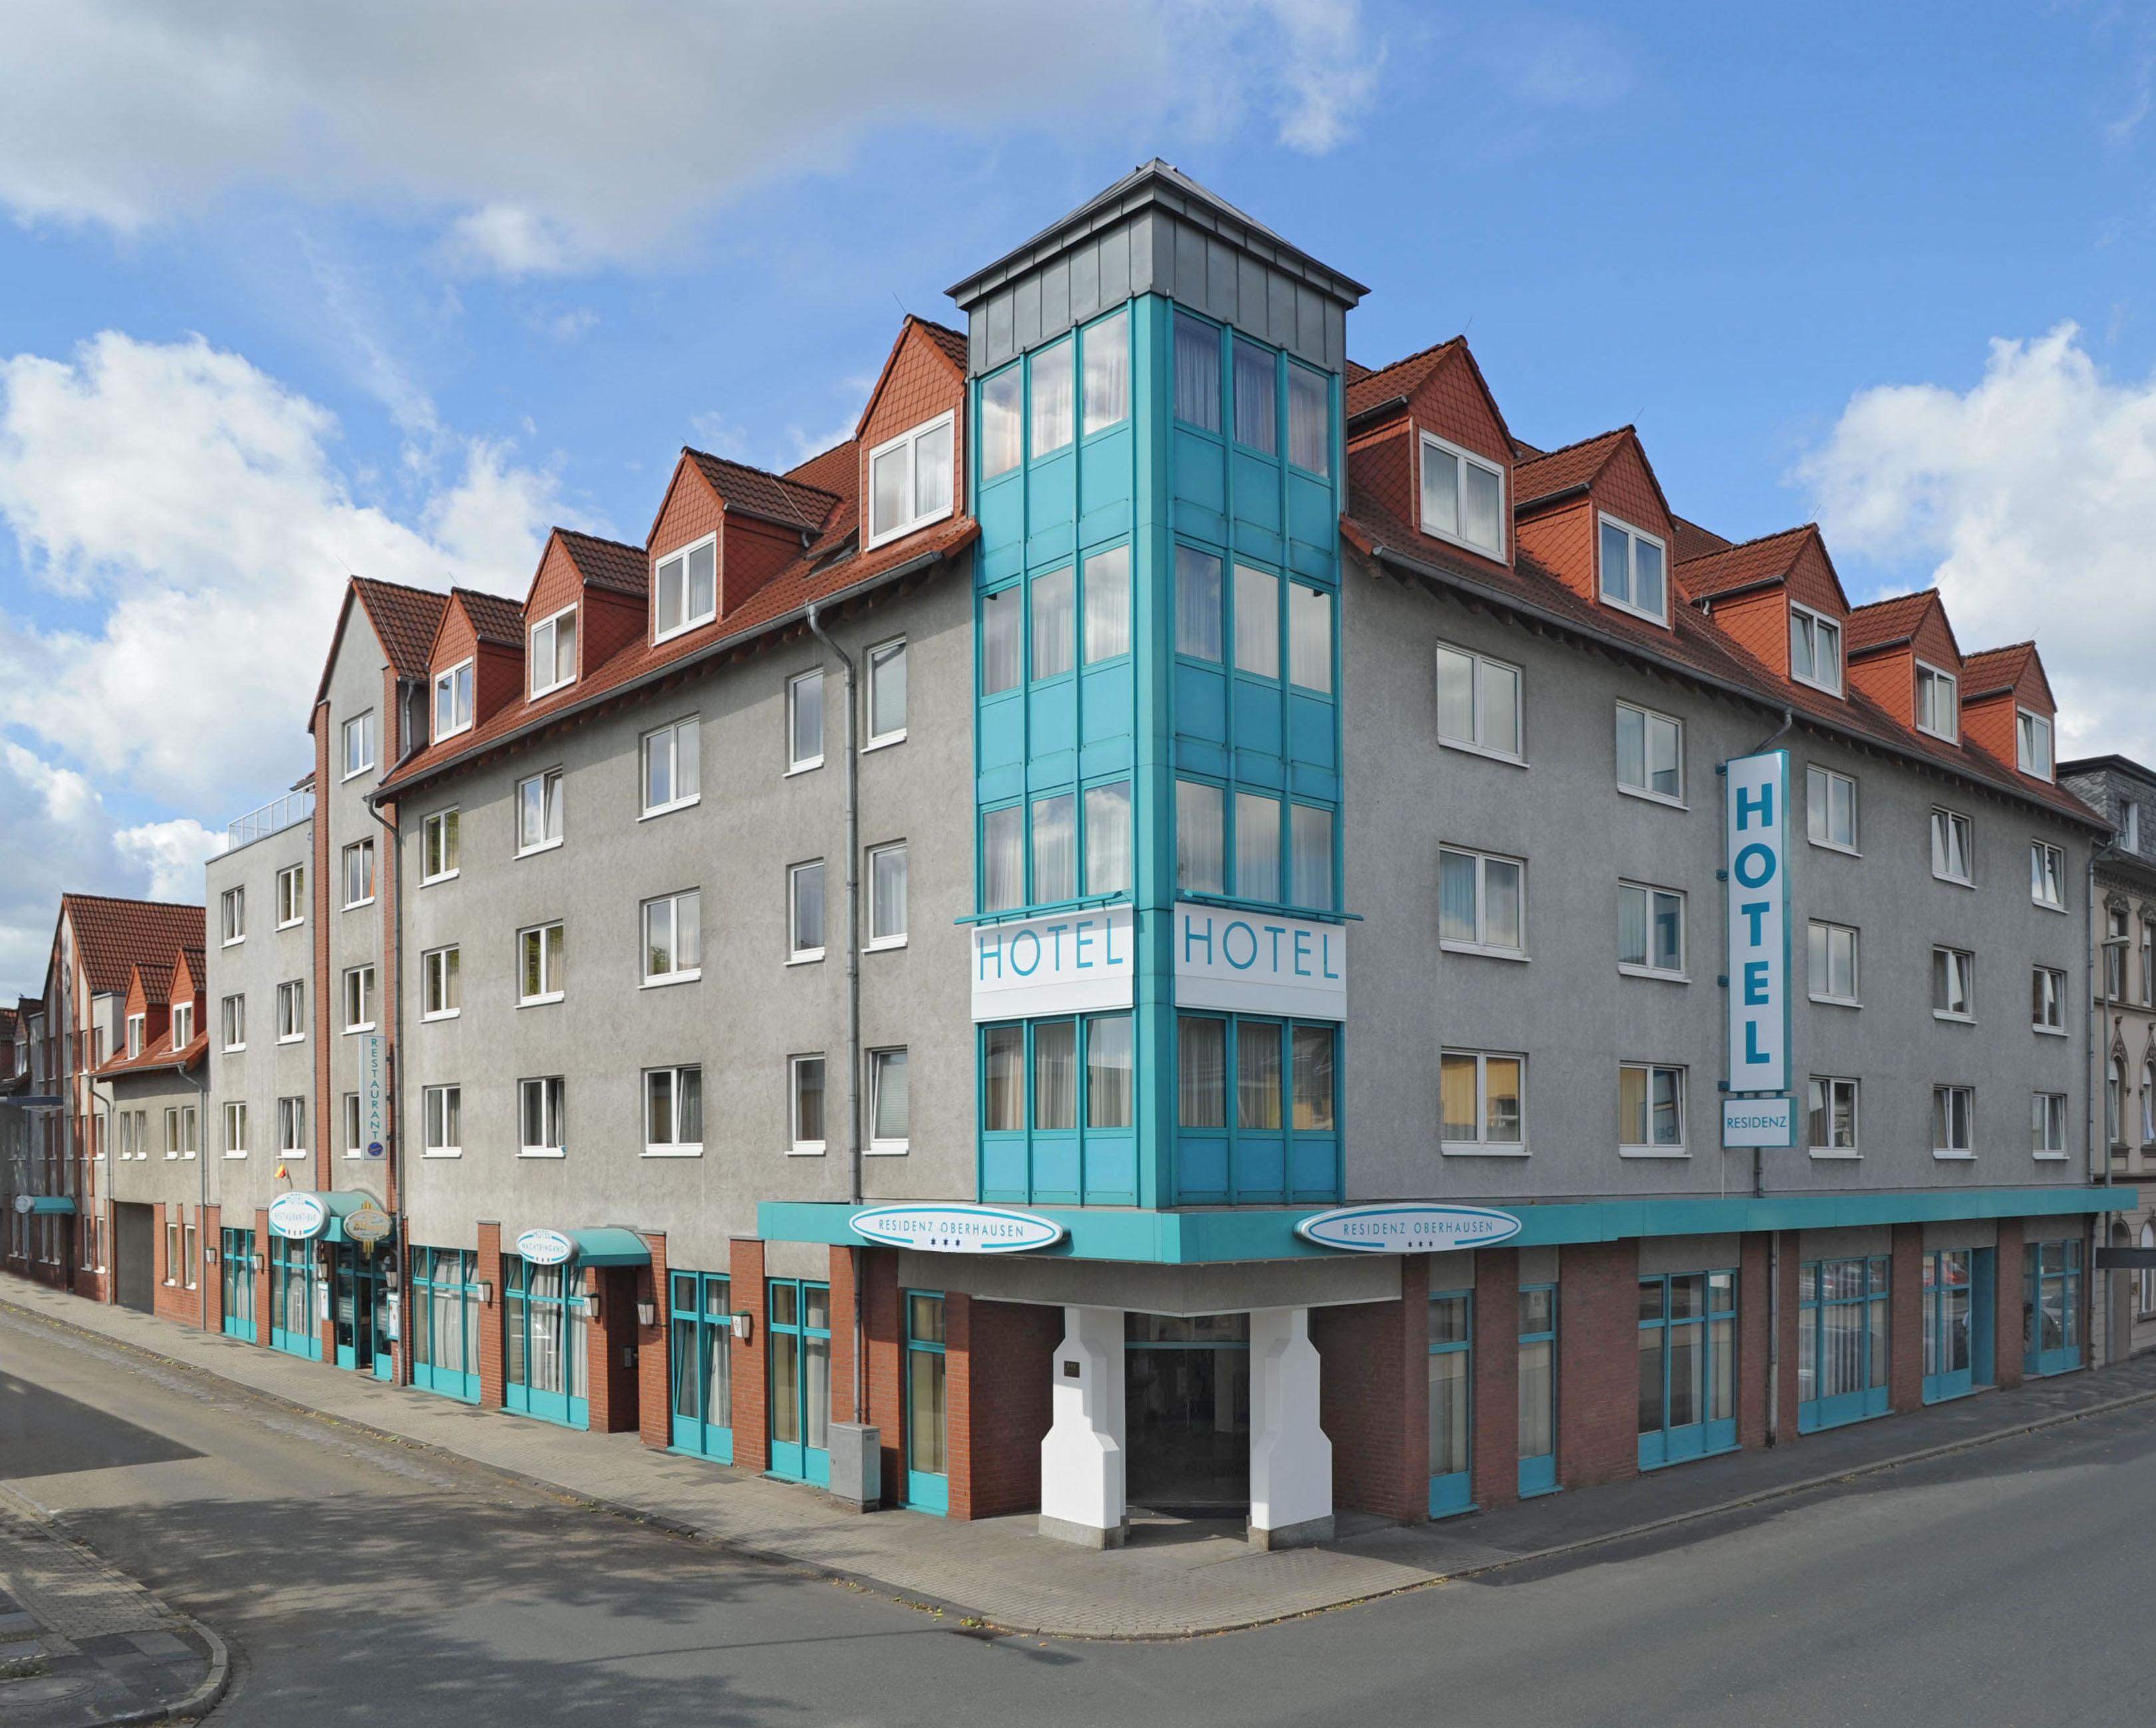 Hotel Residenz Oberhausen, Hermann-Albertz-Straße in Oberhausen